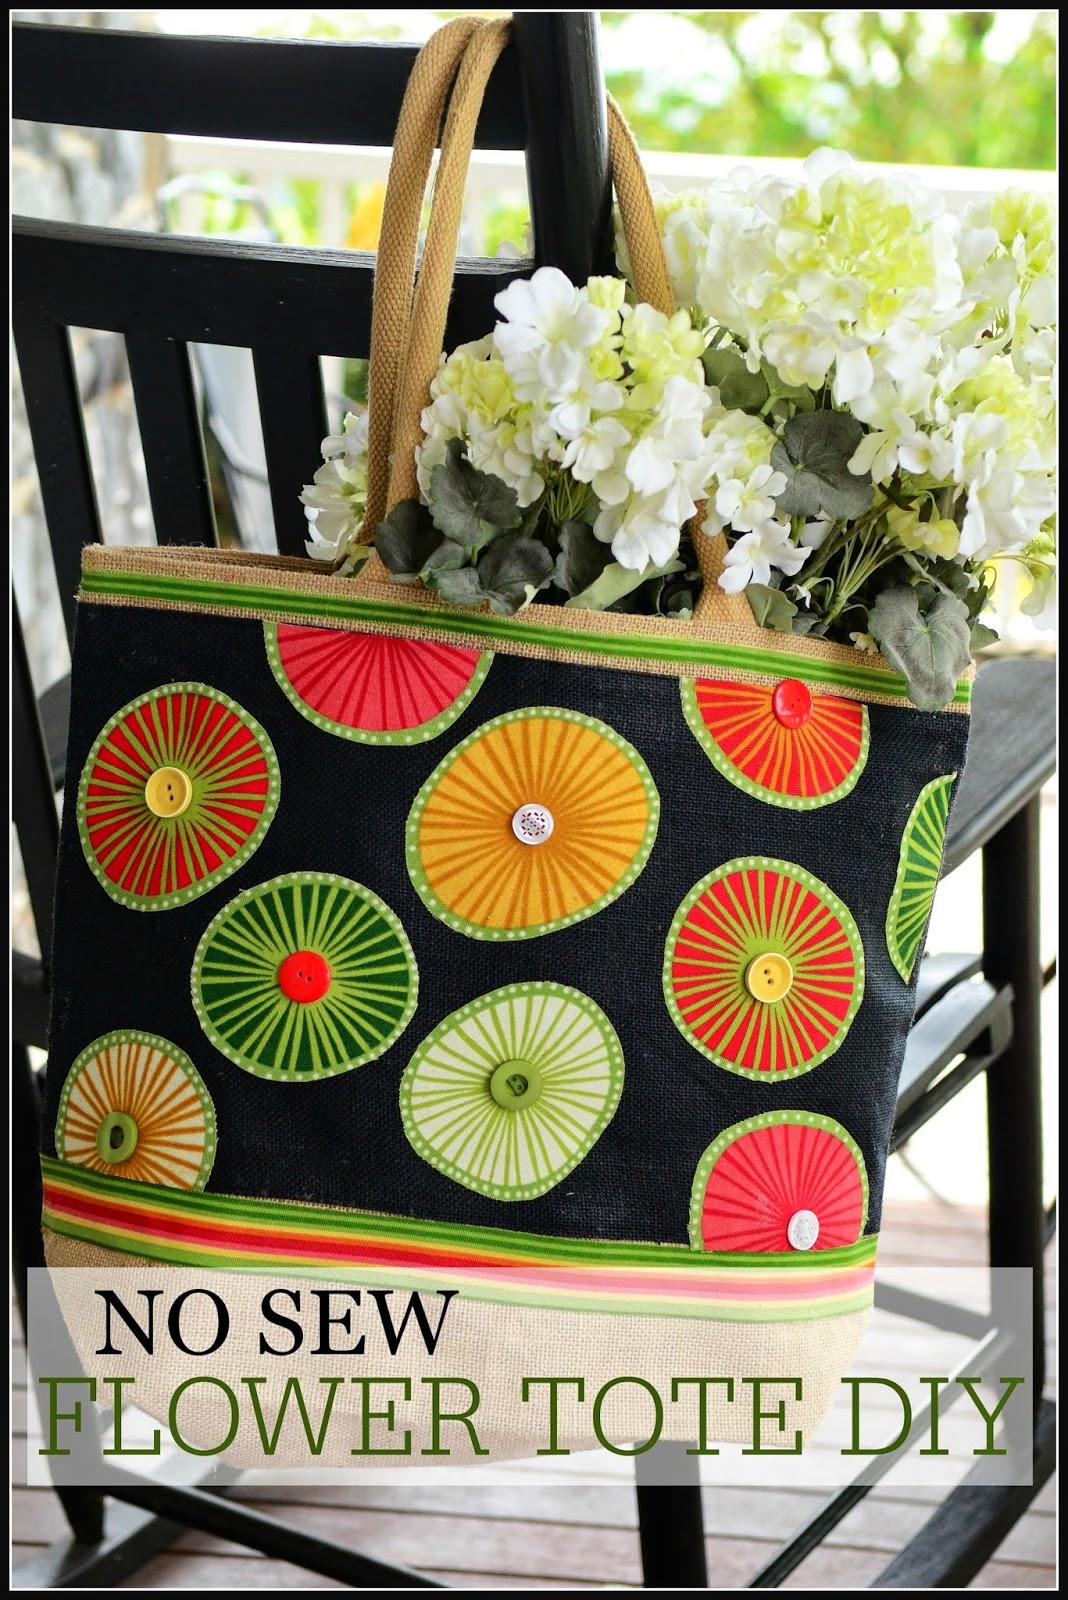 no sew flower tote diy